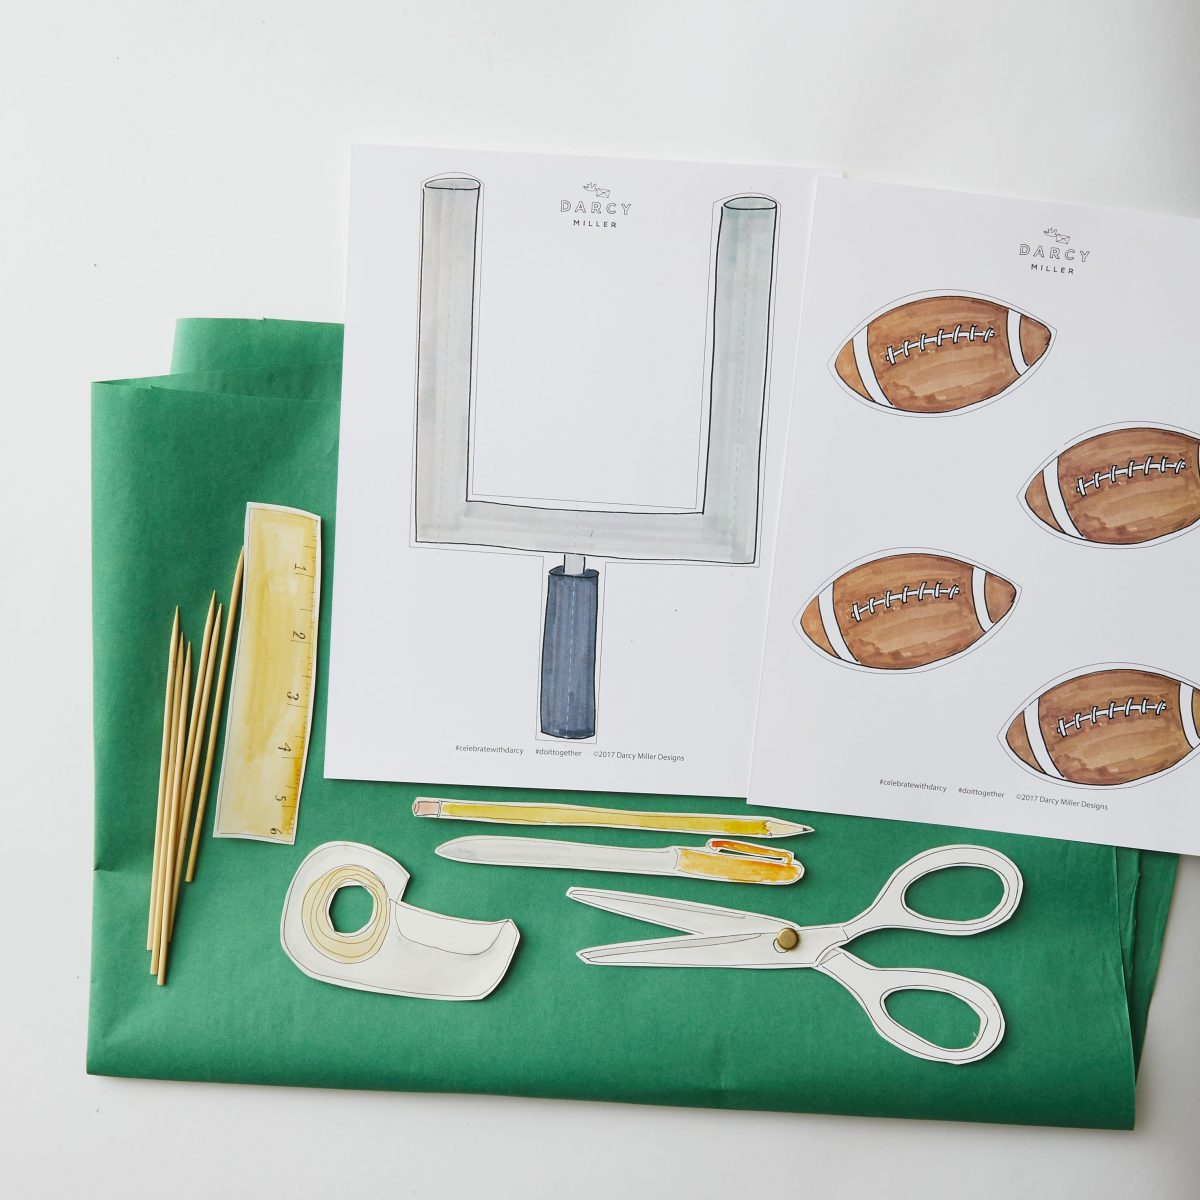 Darcy Miller Designs, Potato Chip Bar, Super Bowl, paper football, goalpost, party pick, paper craft, game day, potato chips, host, hostess, football, football field, snack bar, Darcy Miller, DIY